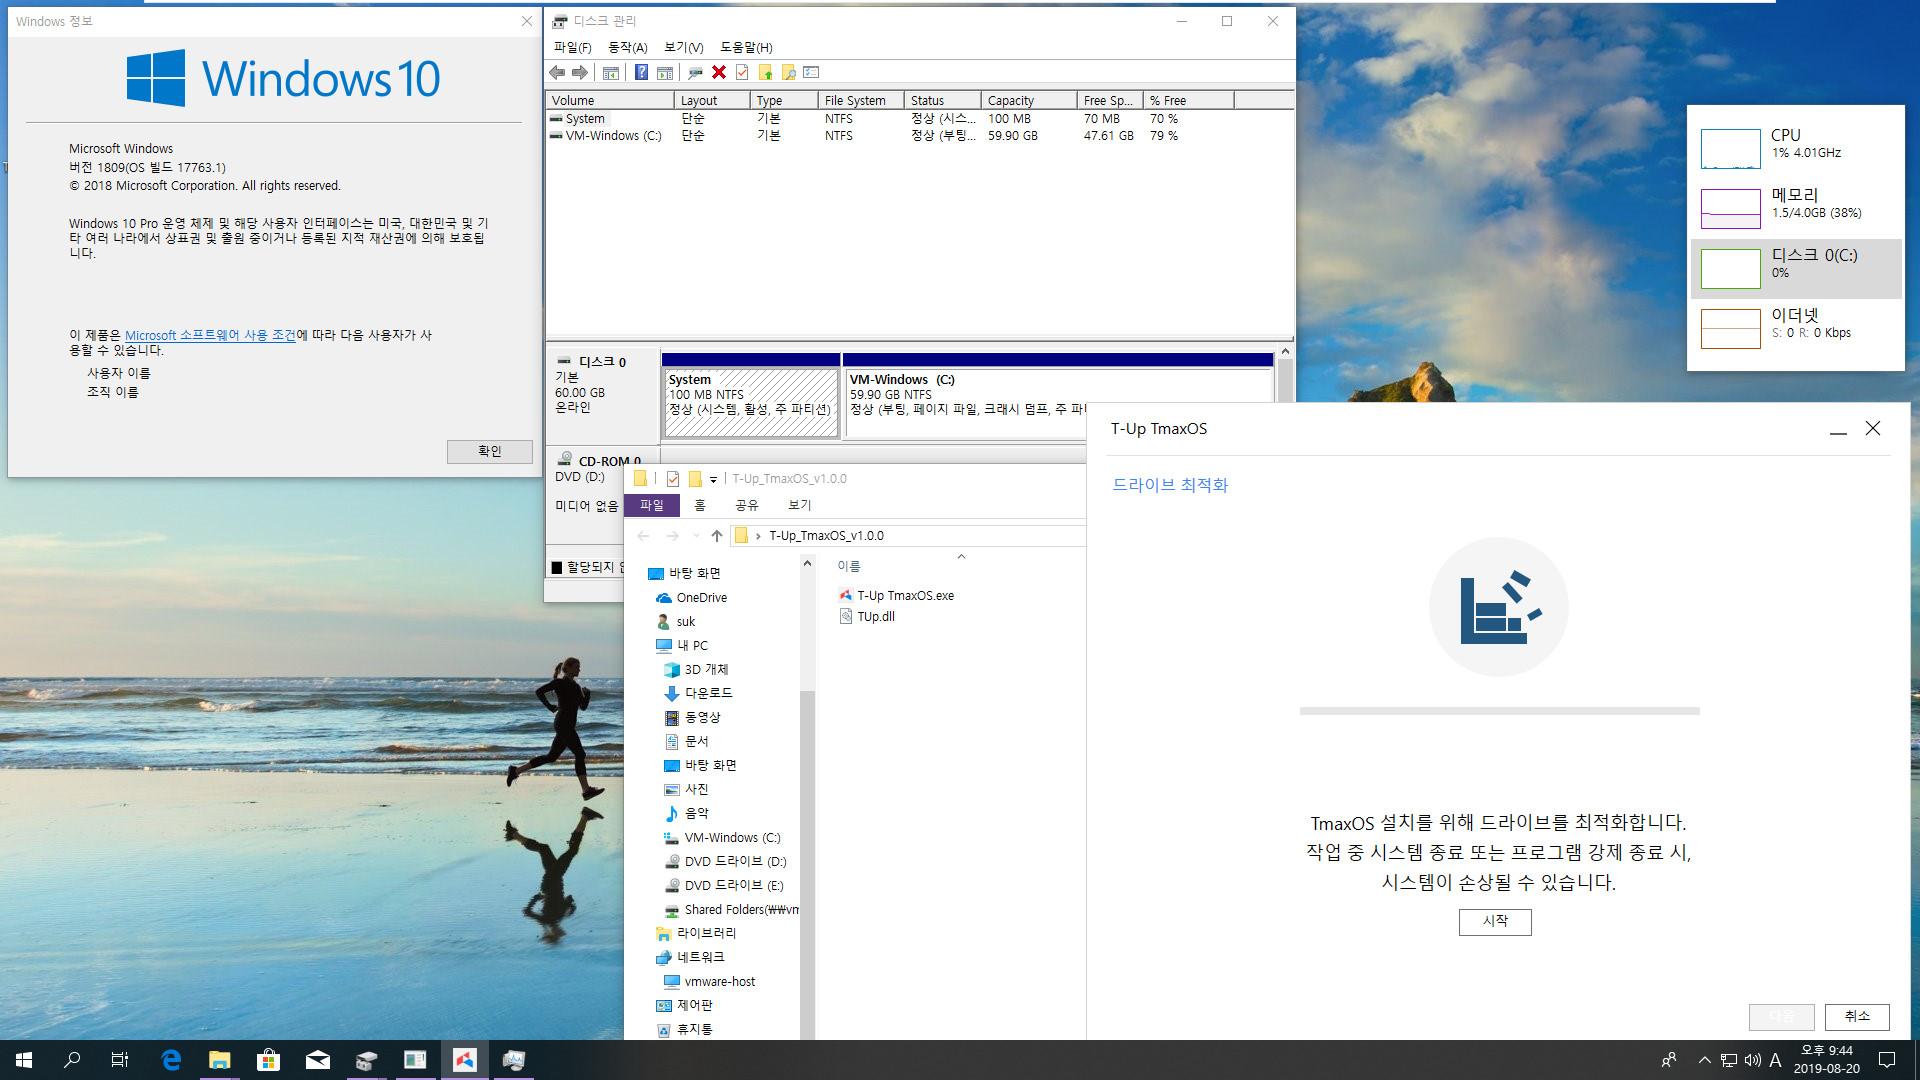 TmaxOS 설치 테스트 - 2번째 시도 - 이번에는 윈도에서 Tmax에서 제공한 T-Up TmaxOS.exe 으로 멀티 부팅으로 설치하기 2019-08-20_214409.jpg